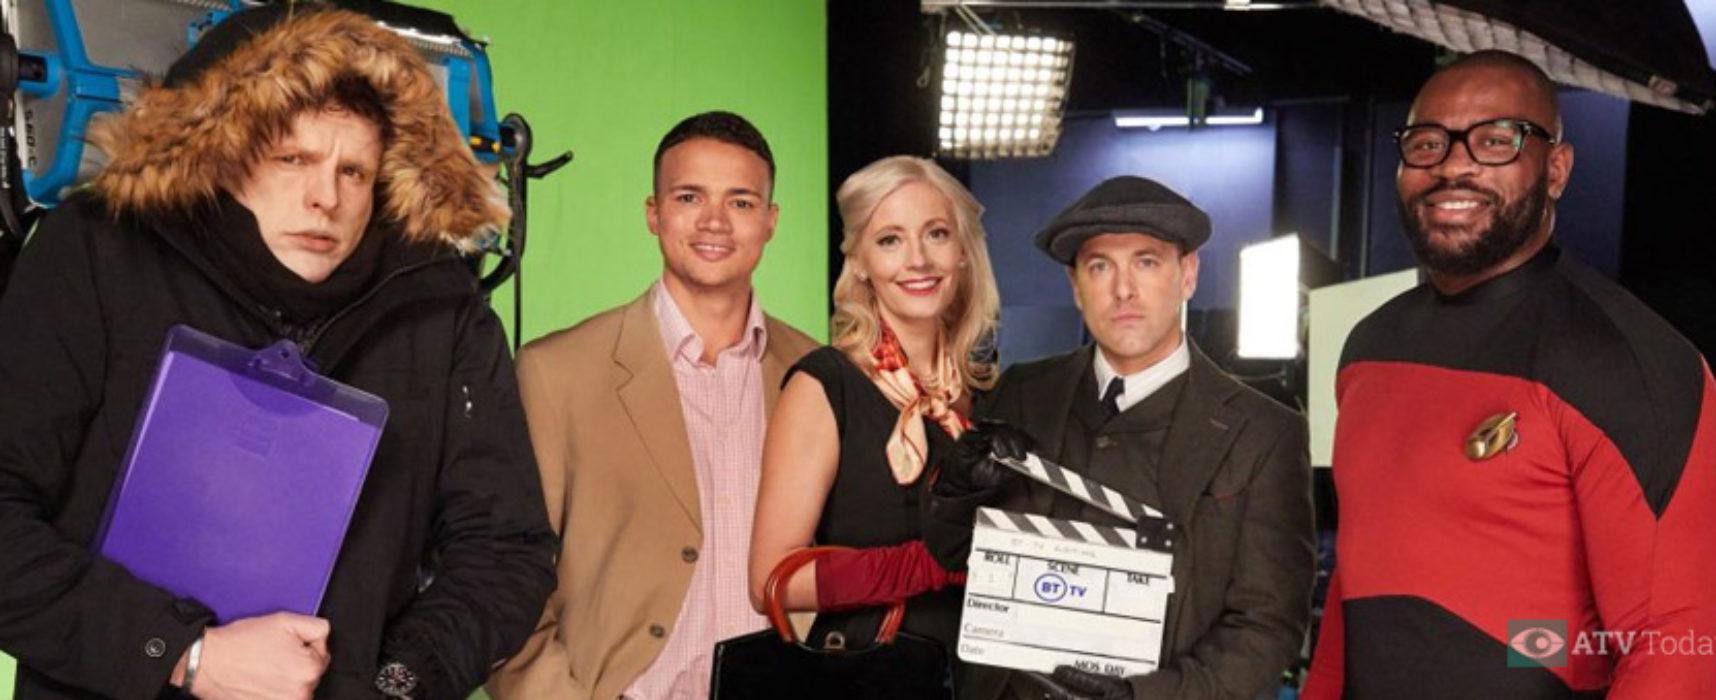 BT Sport presenters take on alternative telly roles